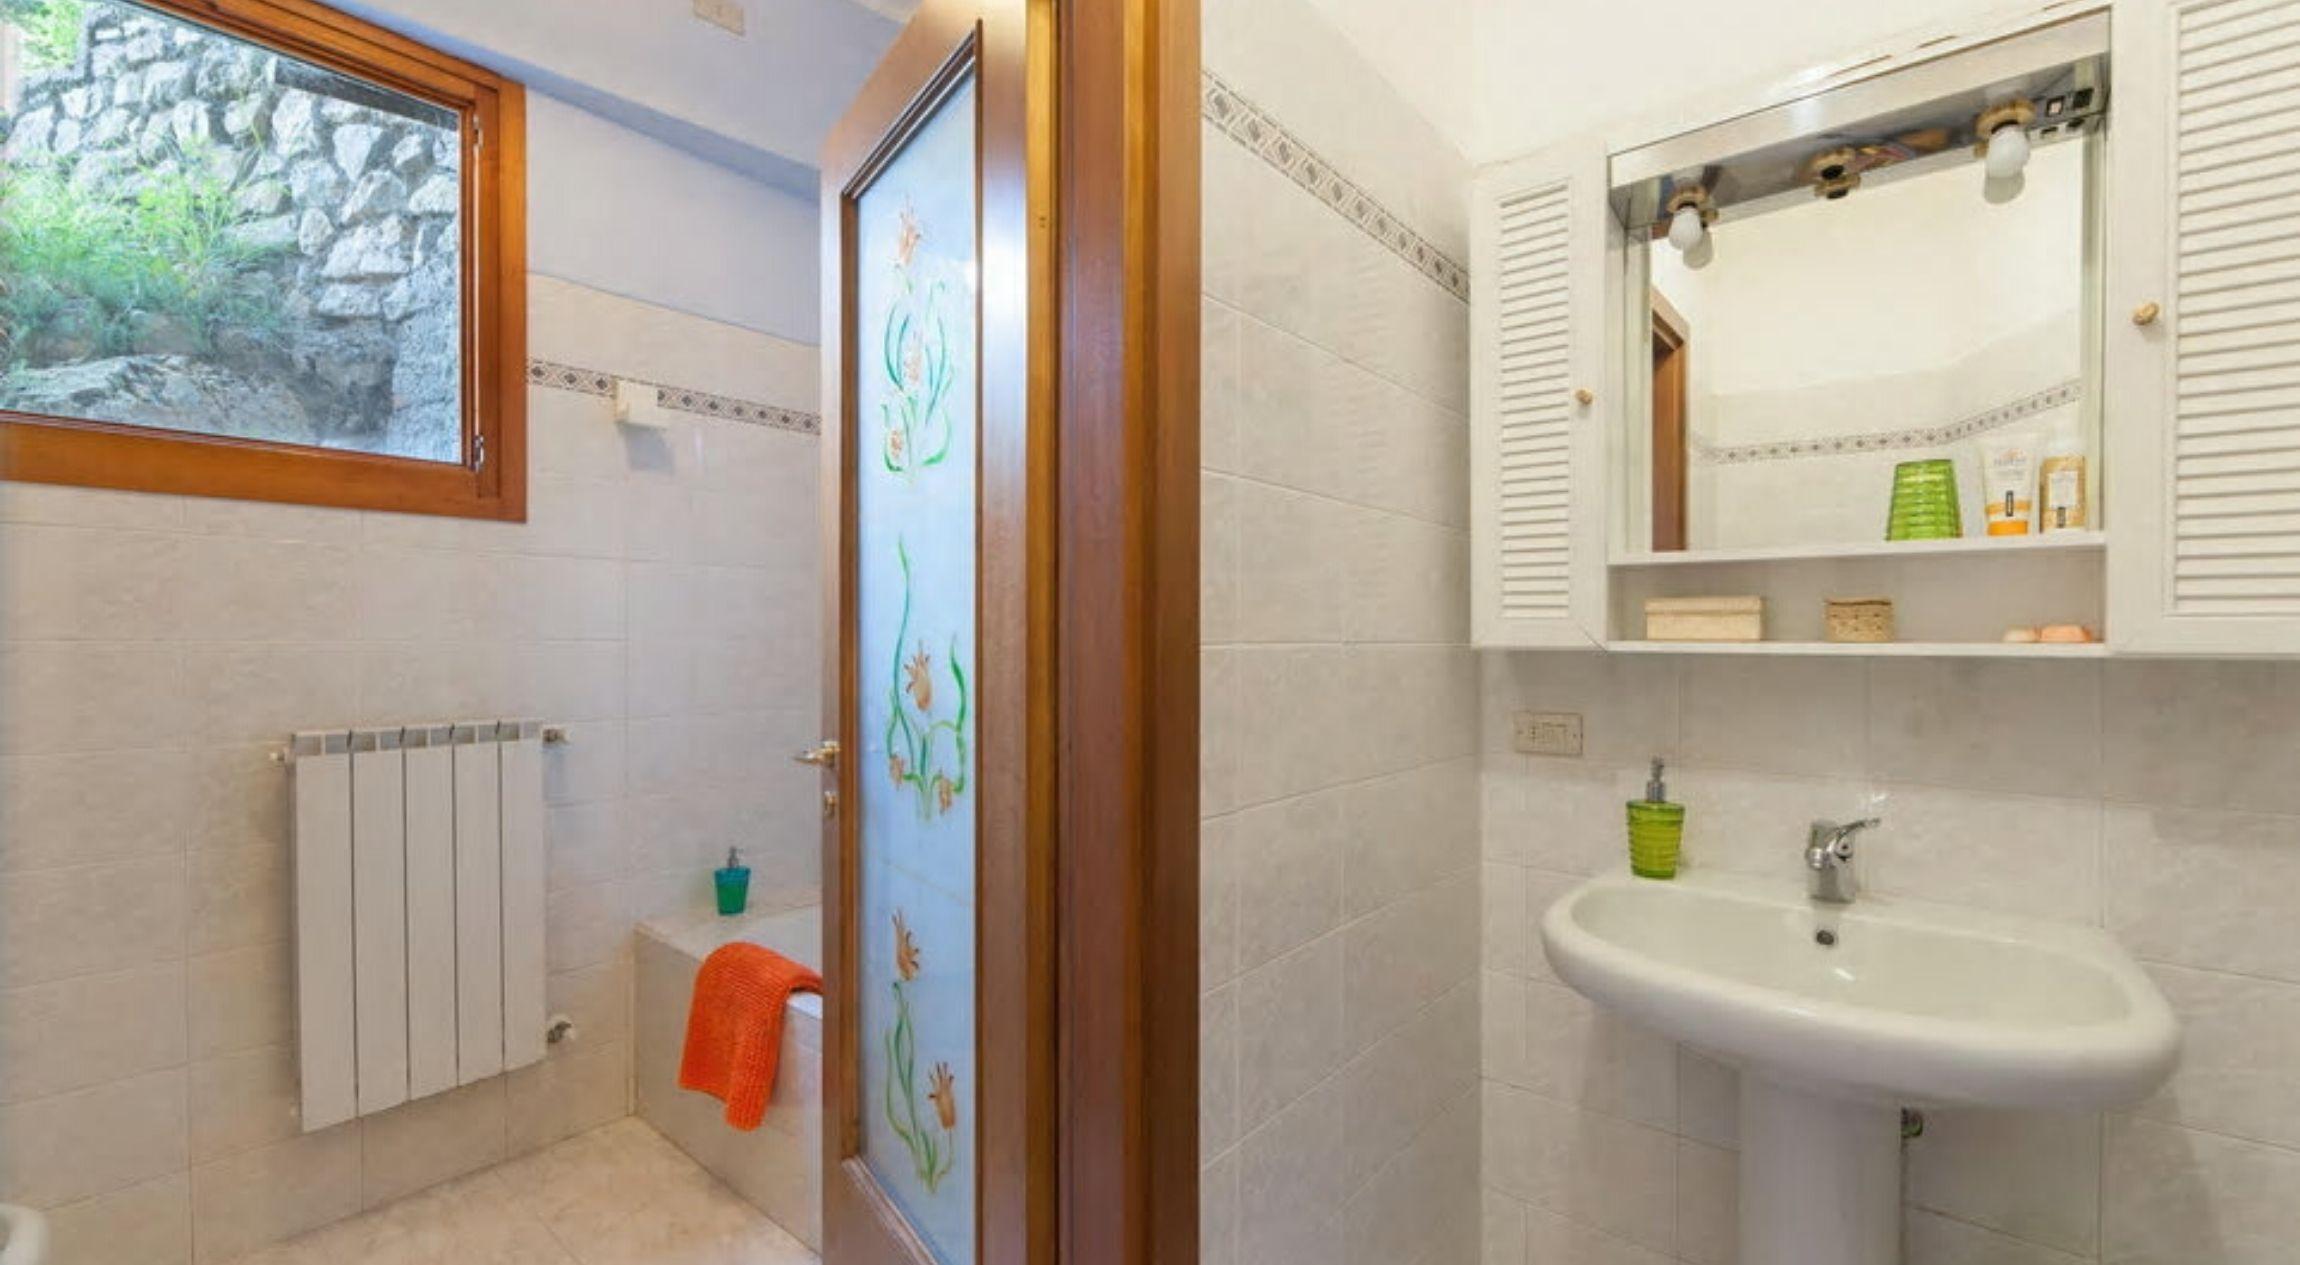 Bagno della camera Peperoncino